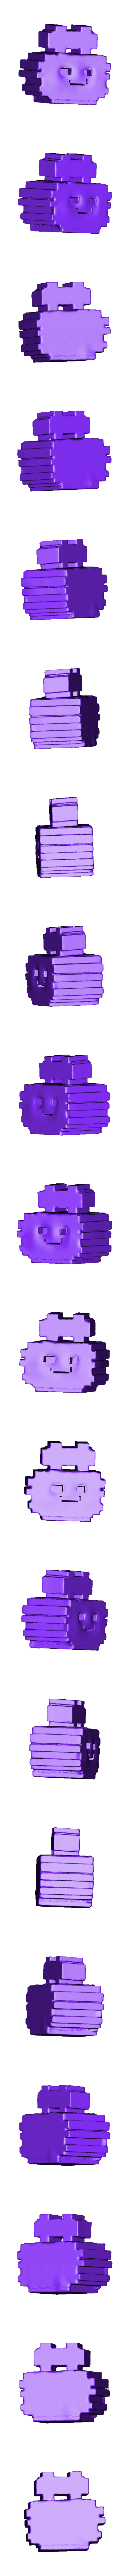 CHORIBOTCHI11.stl Download free STL file CHORIBOTCHI, TAMAGOTCHI BABY Boy • 3D print object, gaaraa